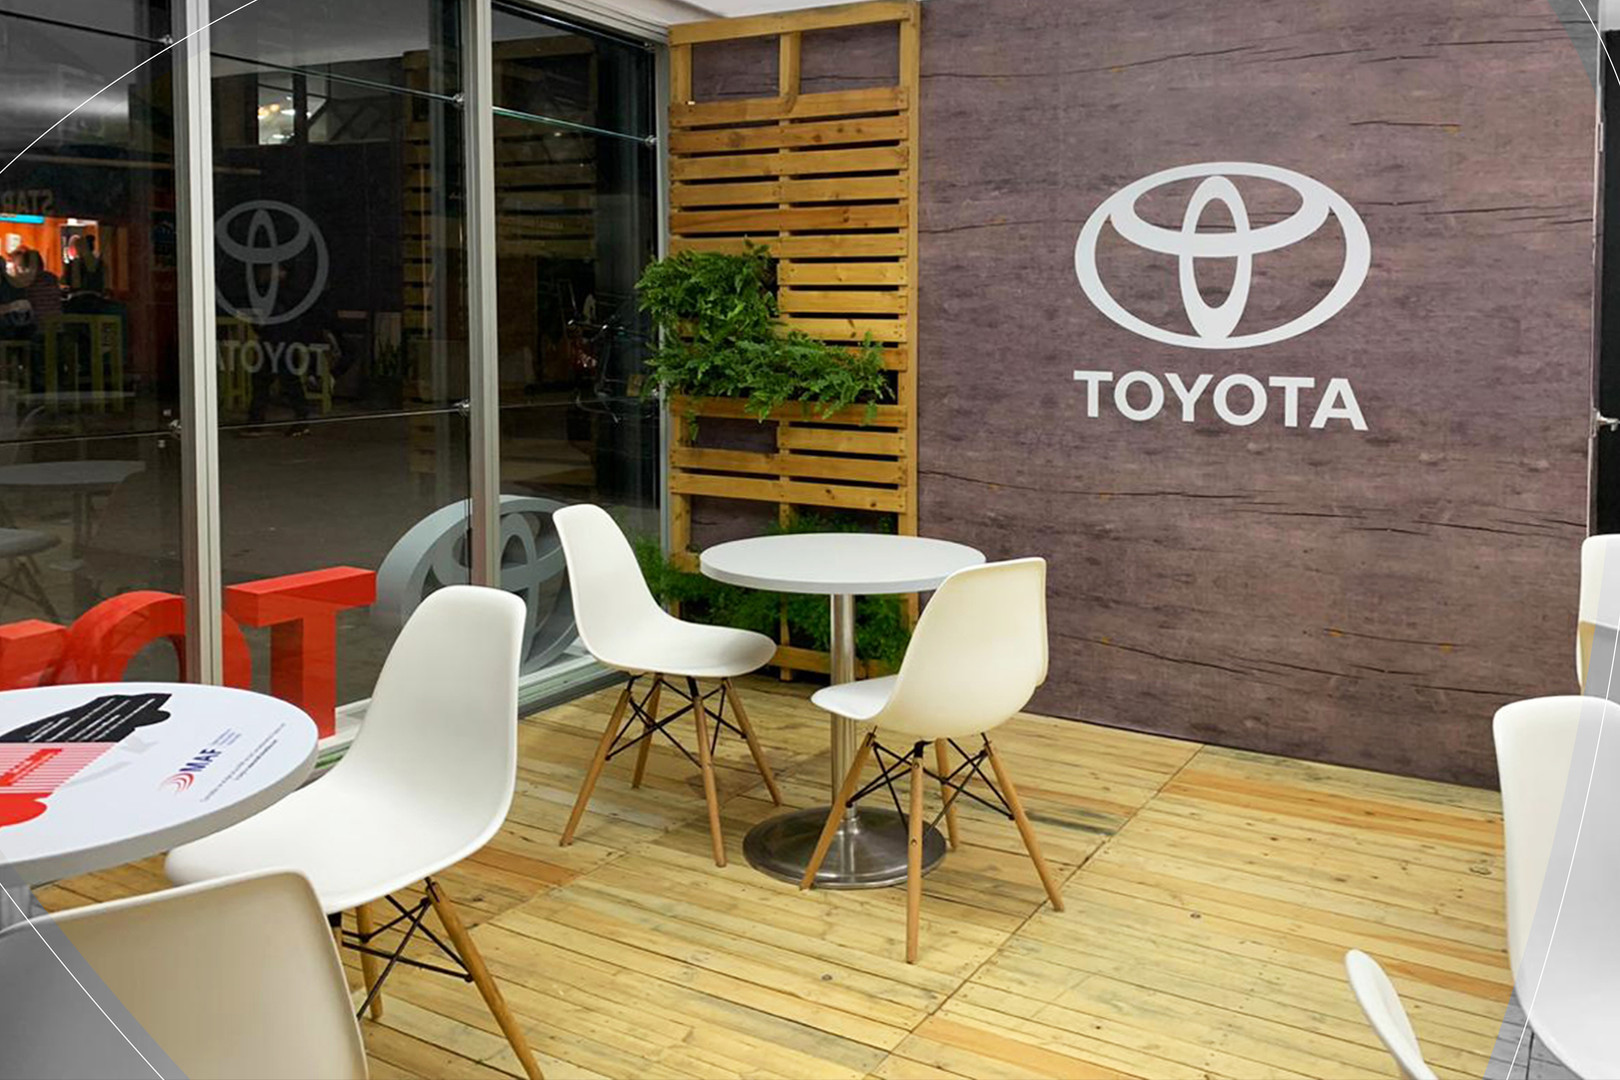 Toyota PHOTO-2019-07-11-17-09-03 2.jpg